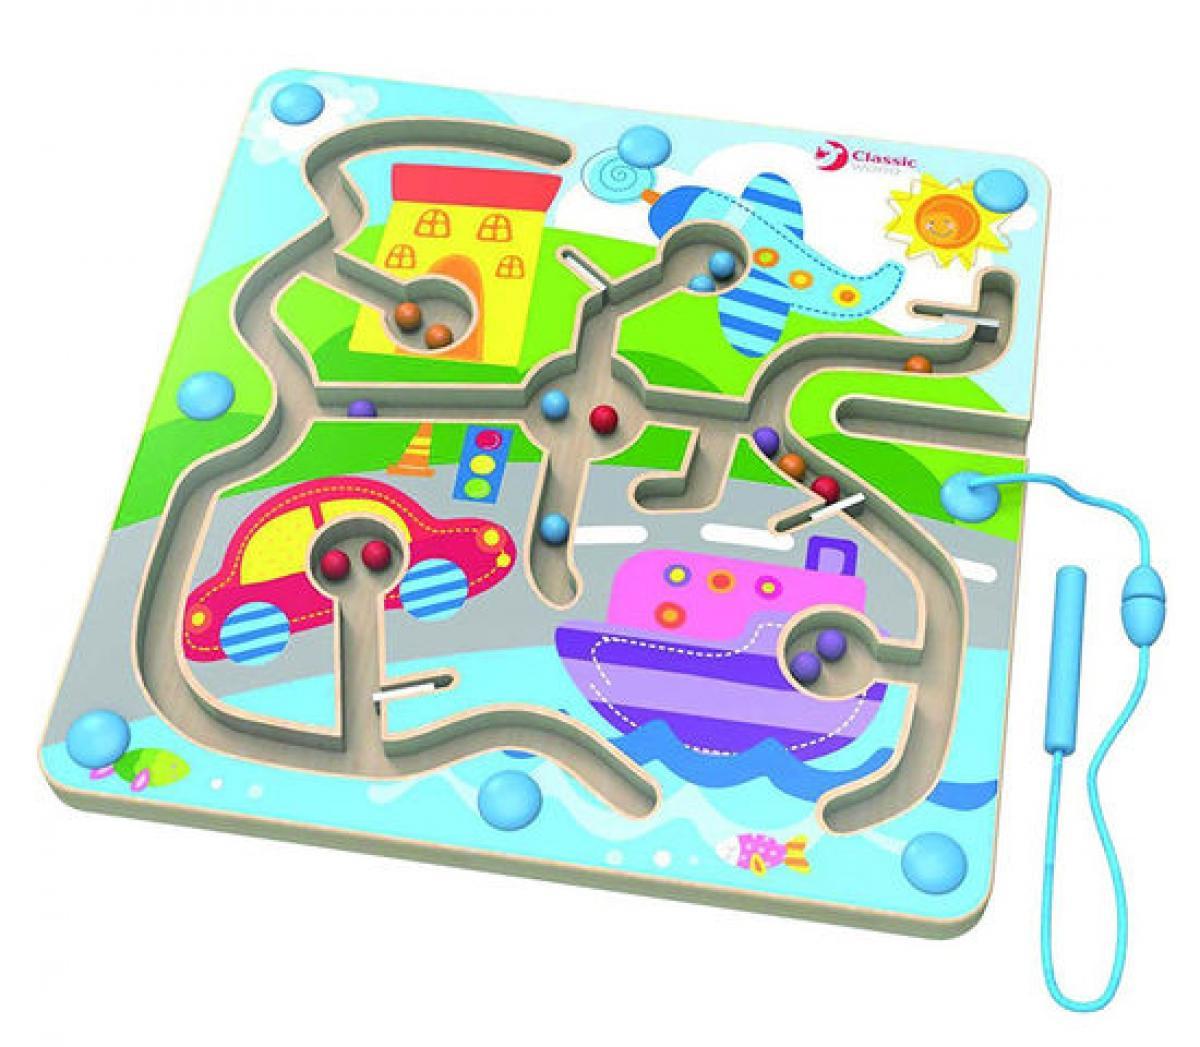 preissturz classic toys magnetisches labyrinth aus holz. Black Bedroom Furniture Sets. Home Design Ideas